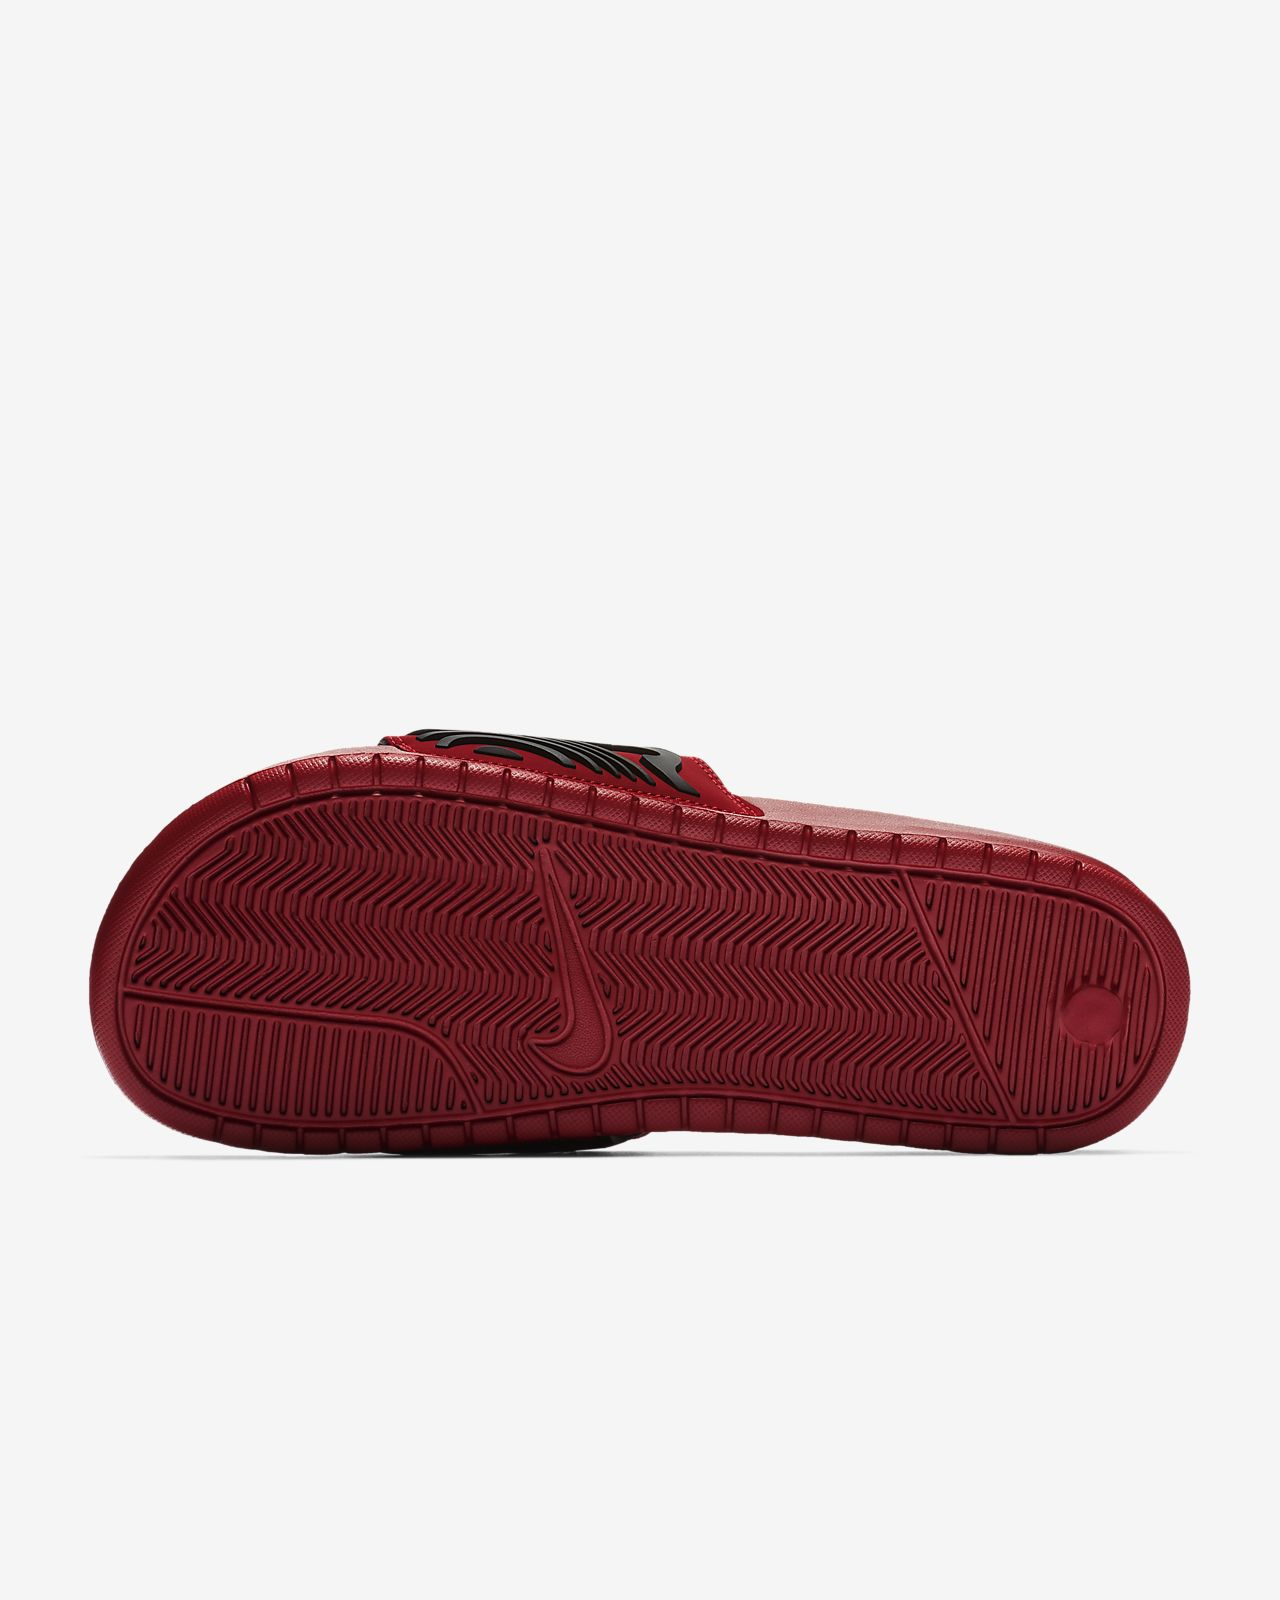 0791c46eceeb Nike Benassi JDI SE Men s Slide. Nike.com GB